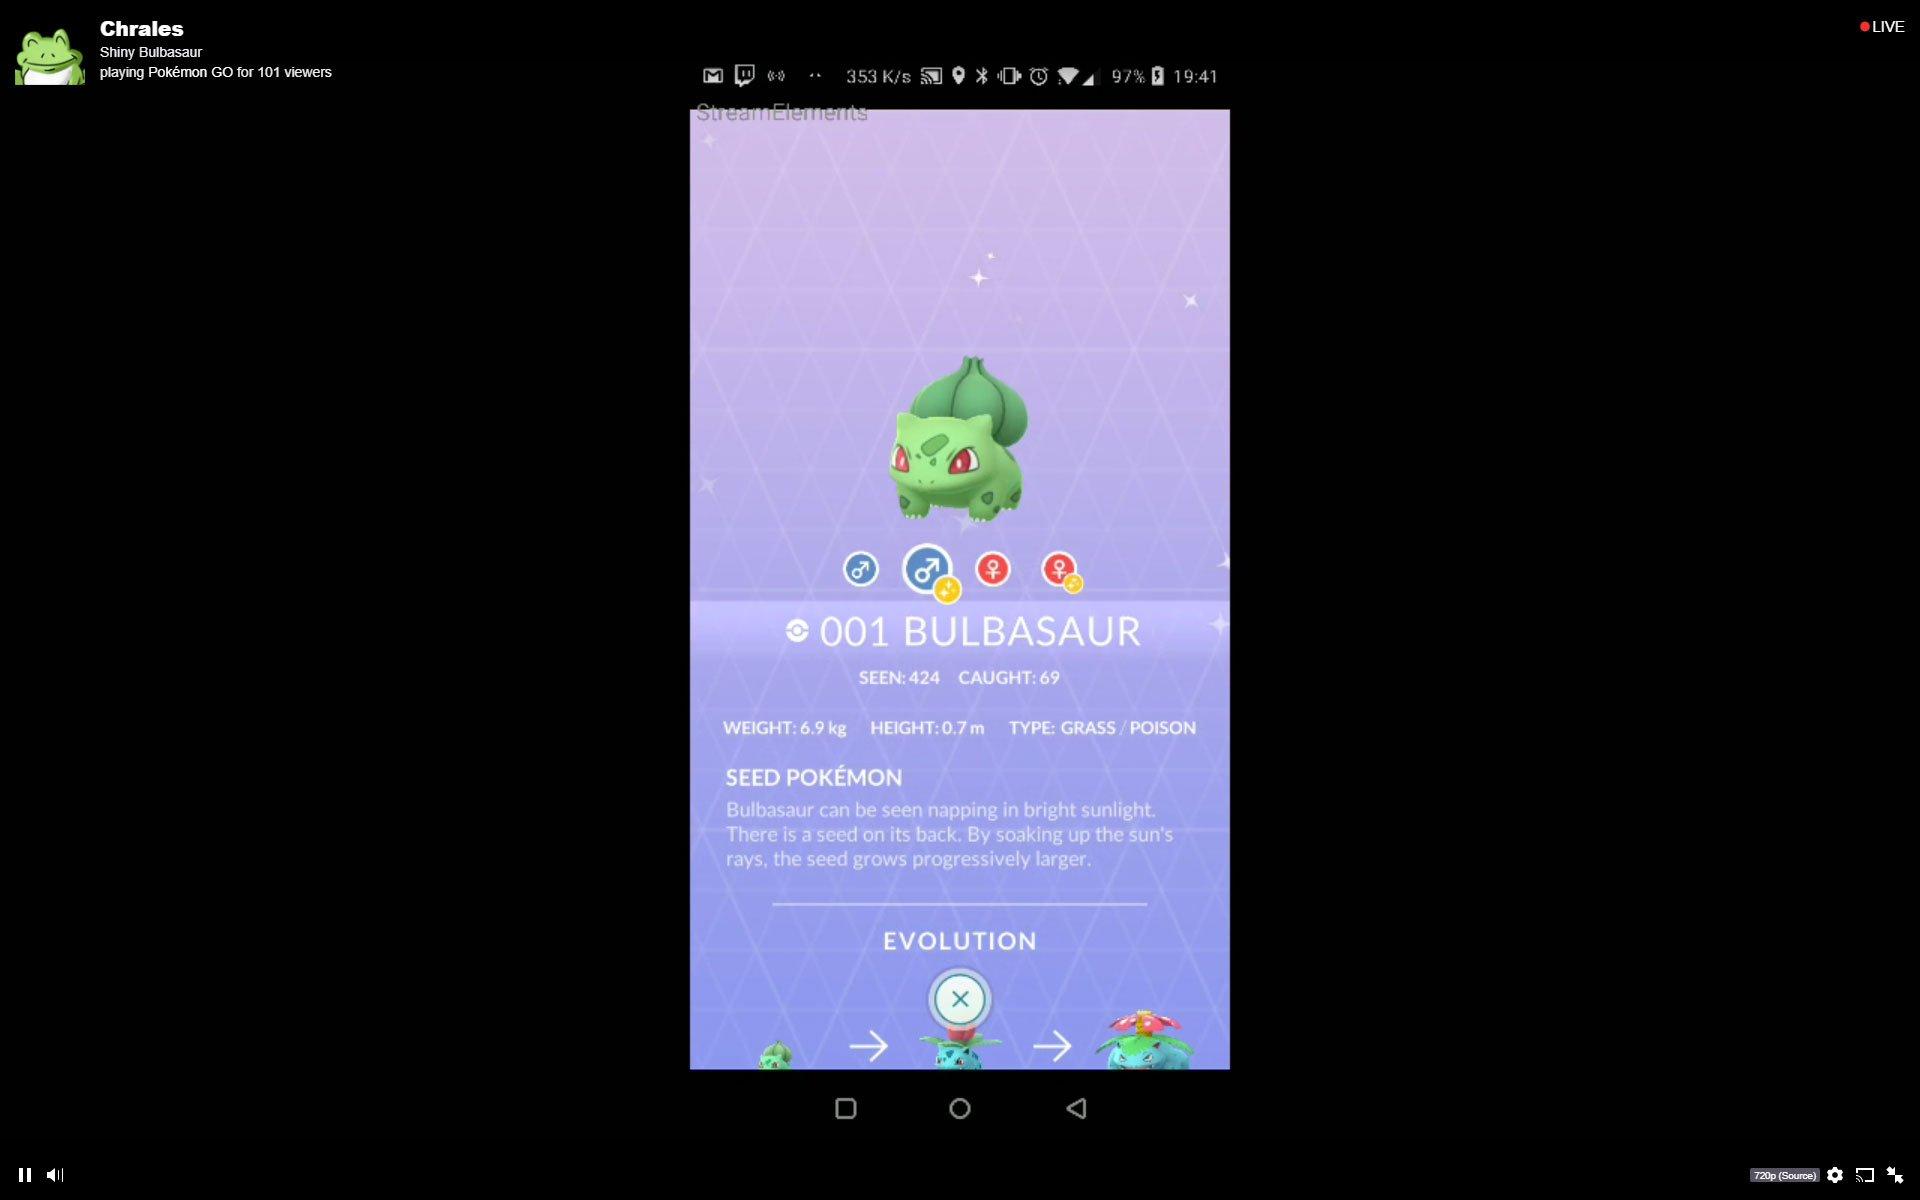 Shiny Bulbasaur Pokemon GO